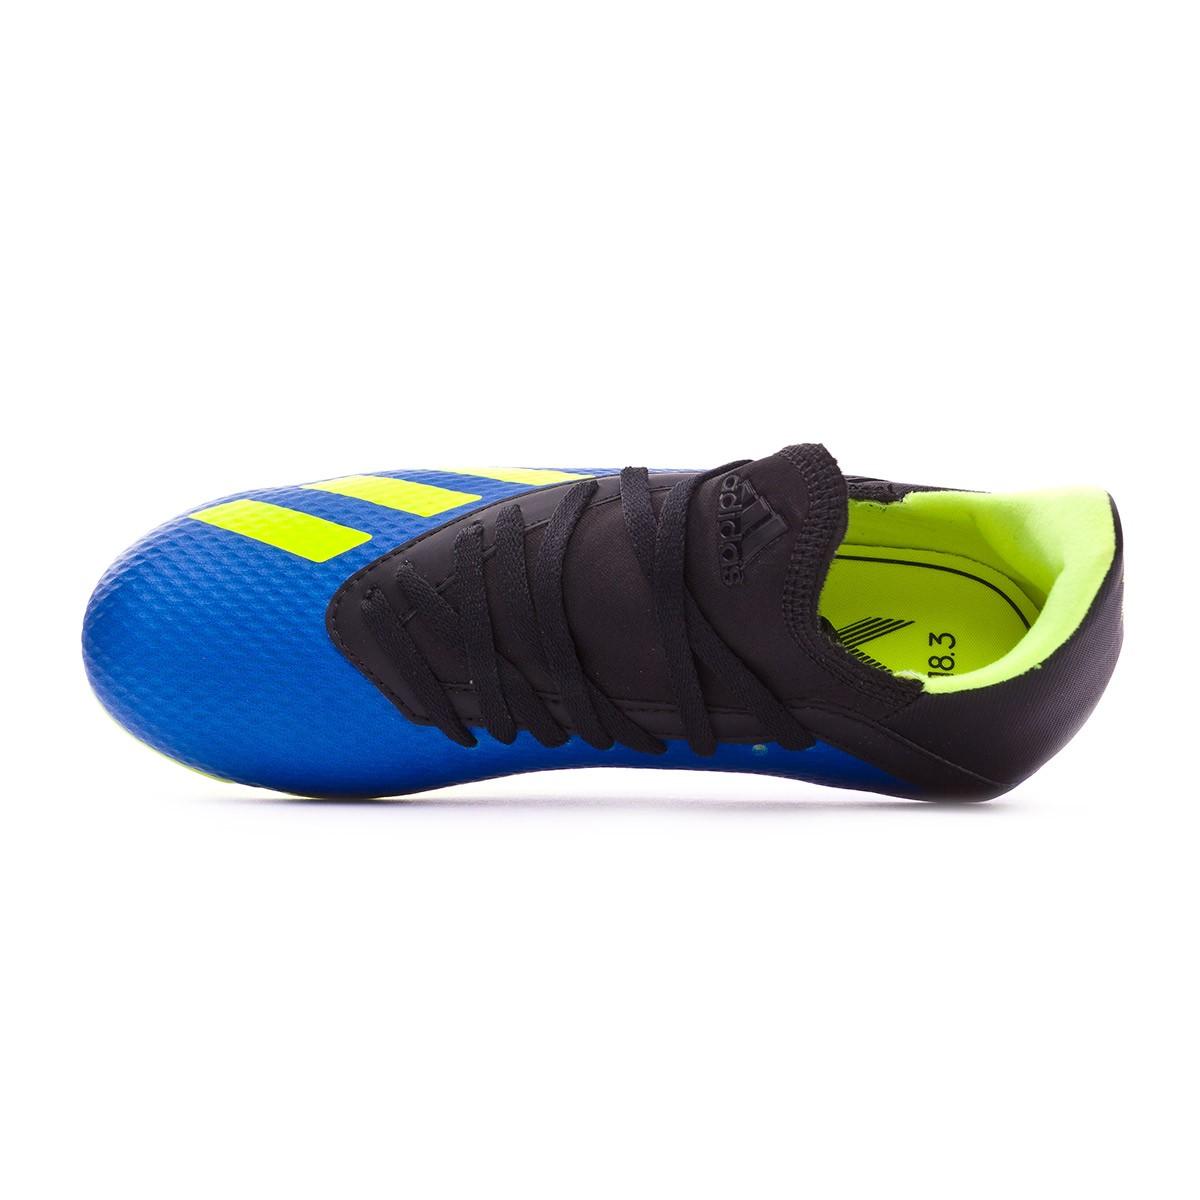 92e5d49956c Football Boots adidas Kids X 18.3 FG Foot blue-Solar yellow-Black - Tienda  de fútbol Fútbol Emotion